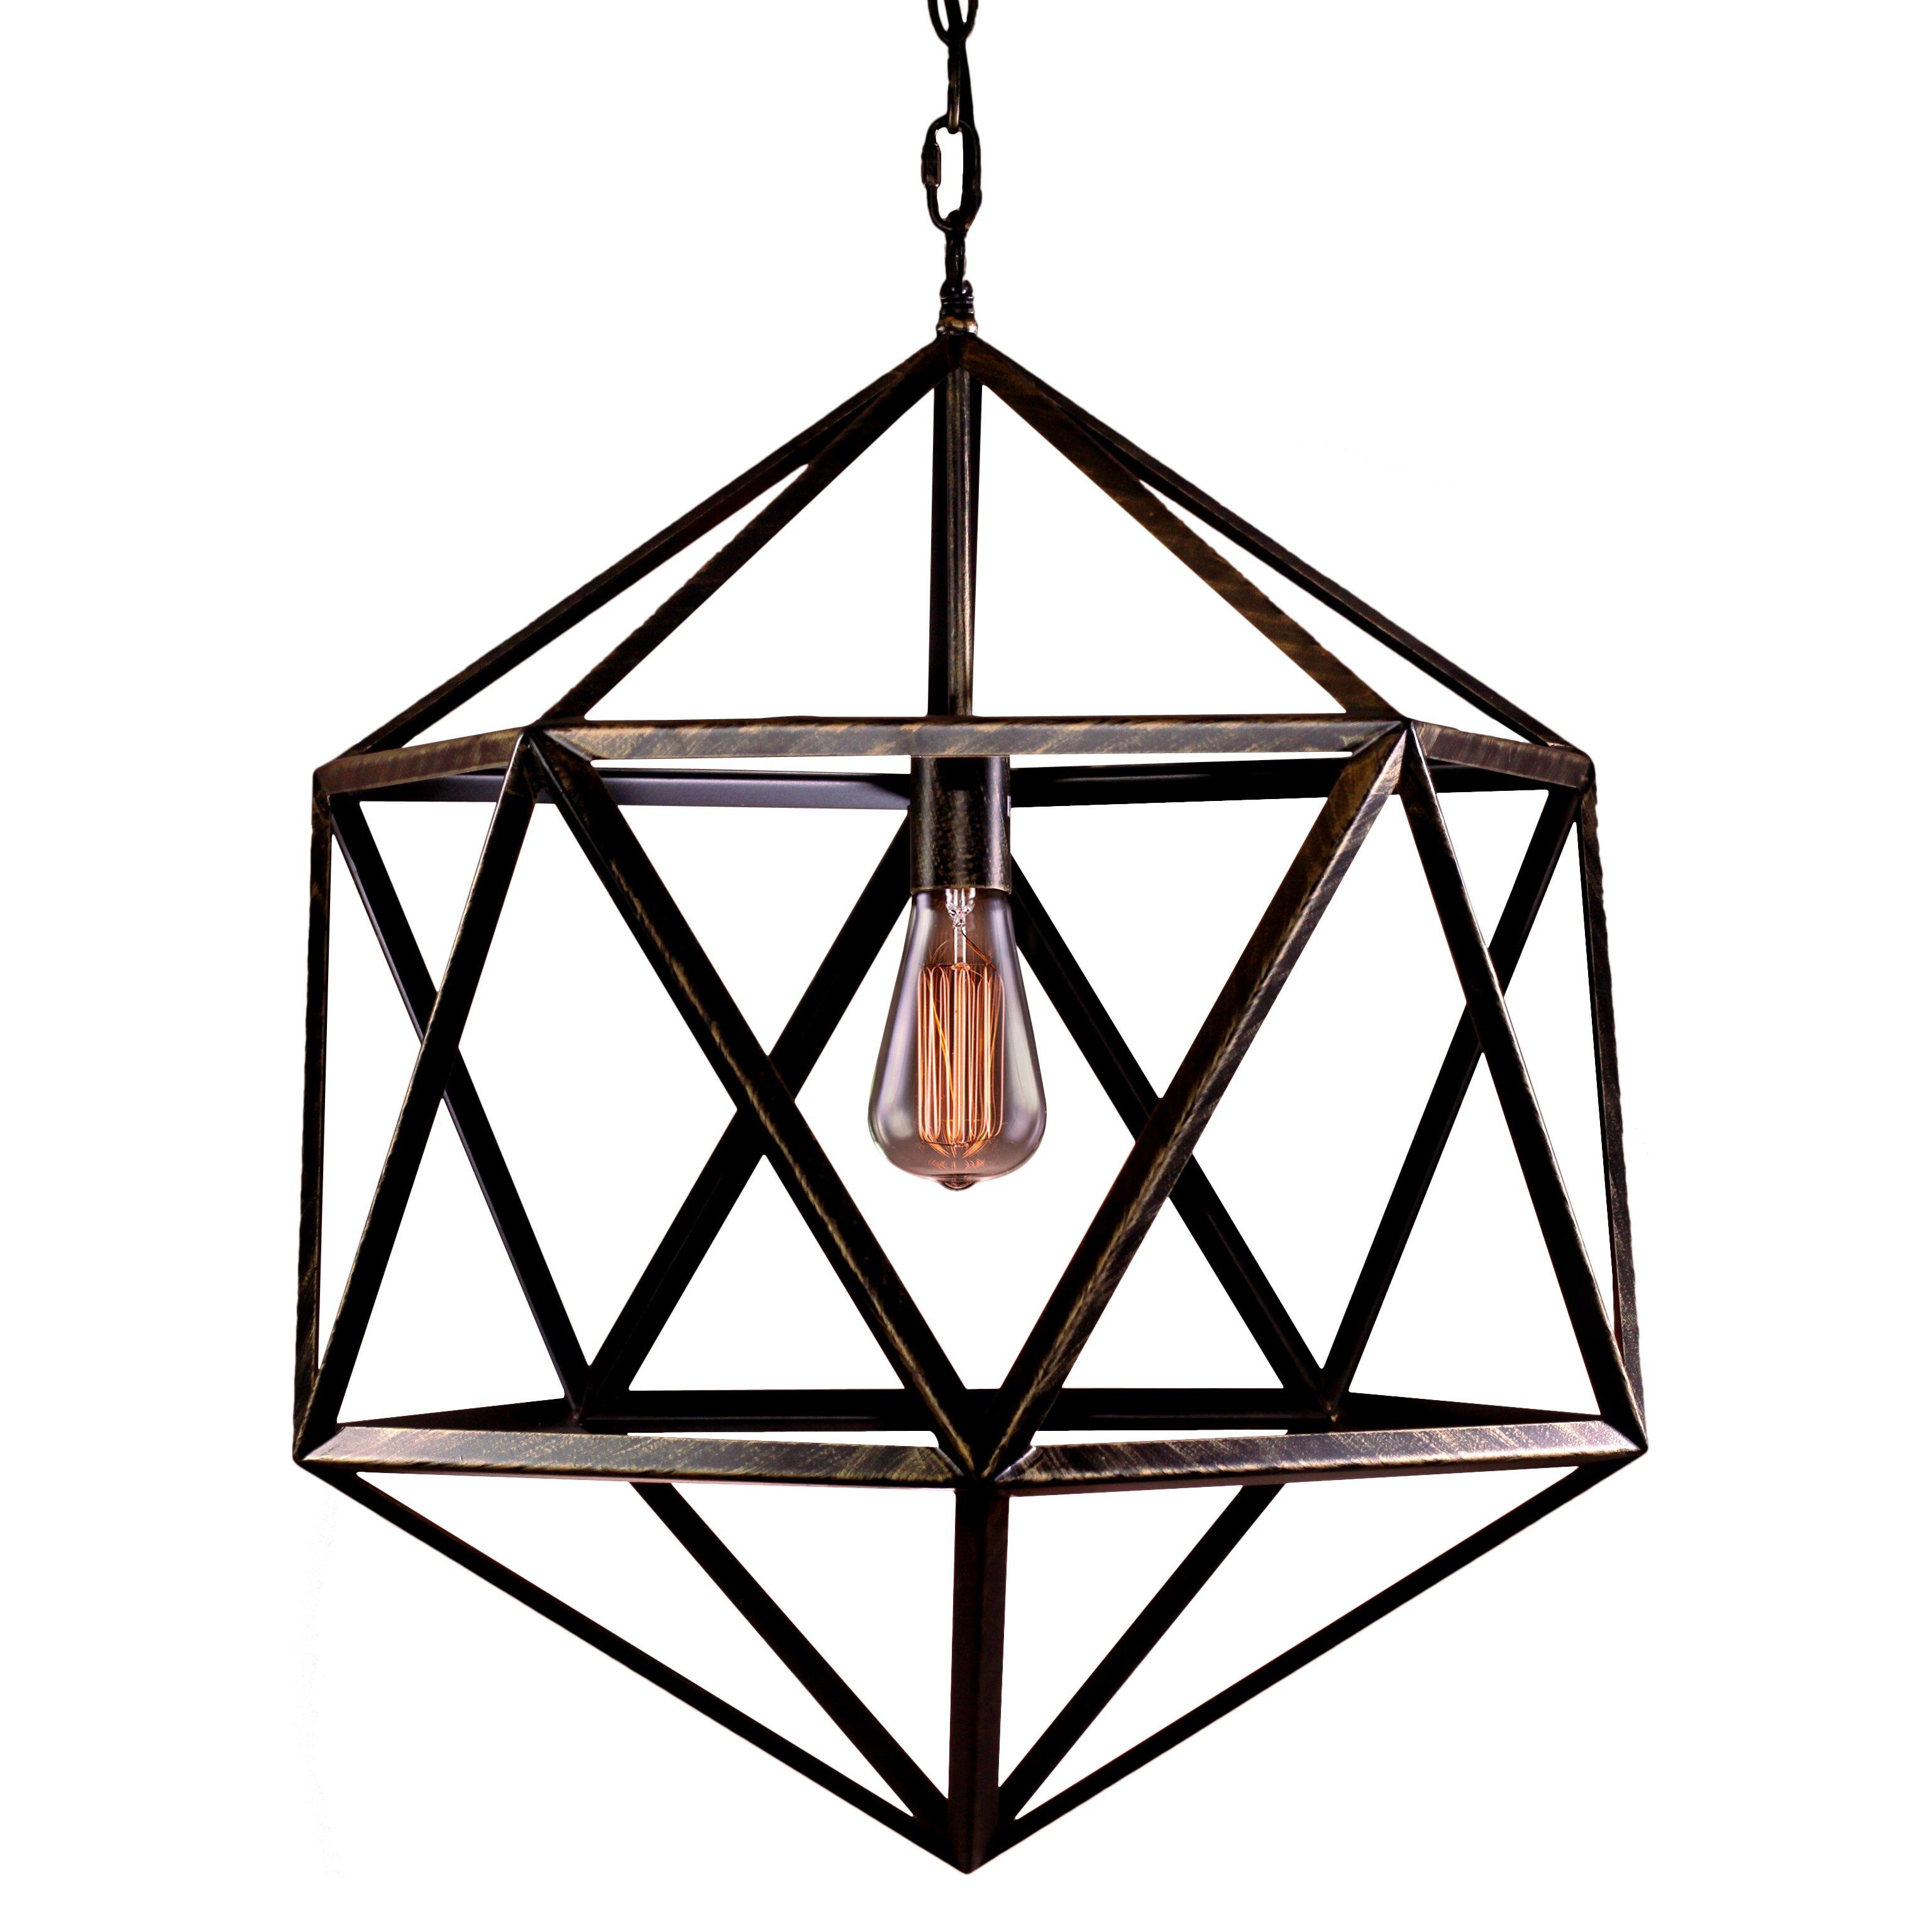 Foyer Lighting Tiffany Style : Warehouse of tiffany mccoy light foyer pendant reviews